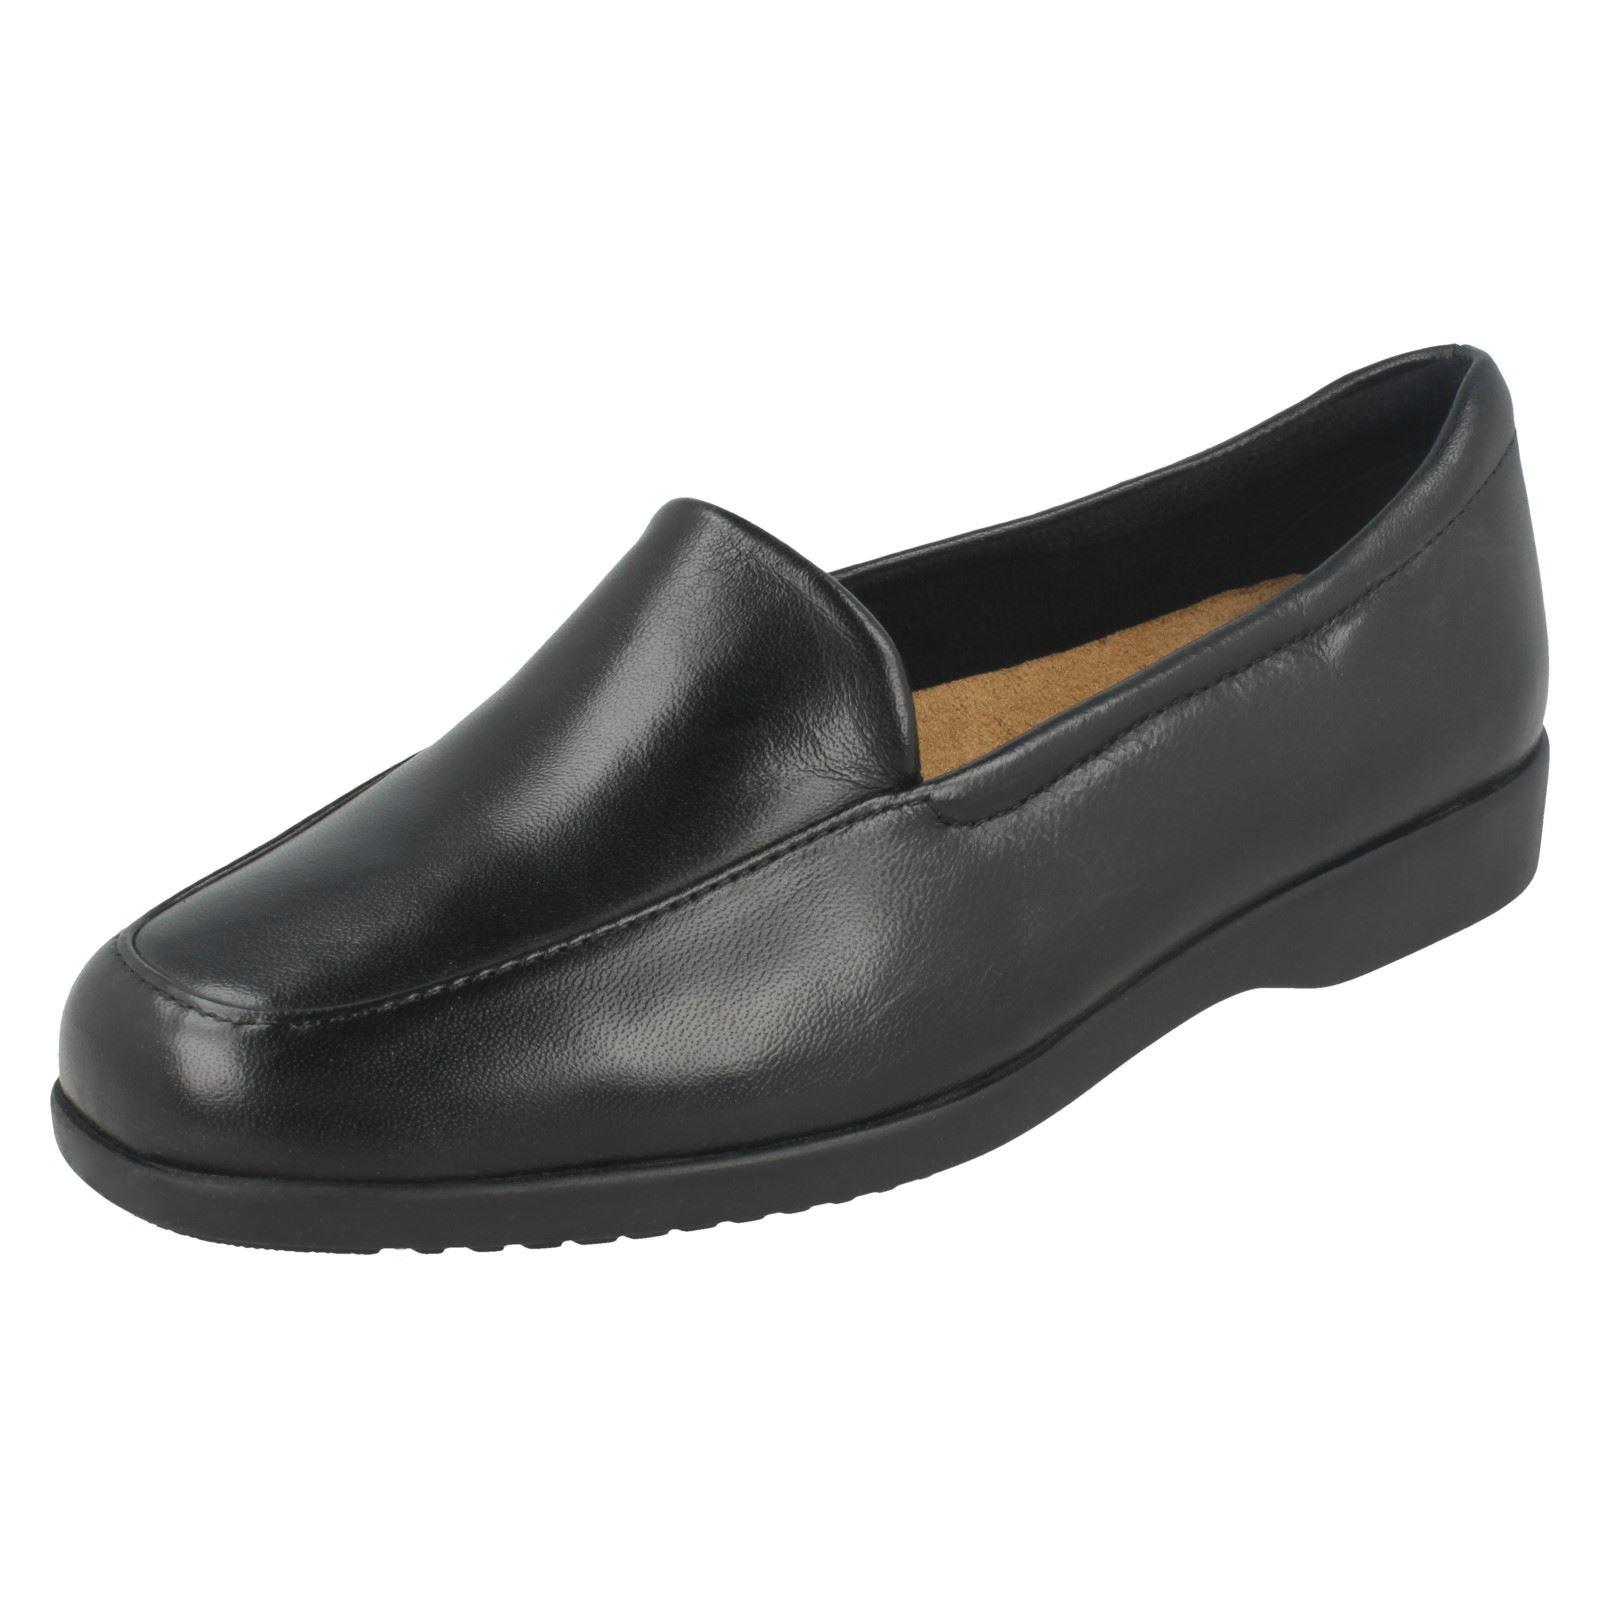 Details zu Damen Clarks Georgia Flache Mokassins Stil Schuhe